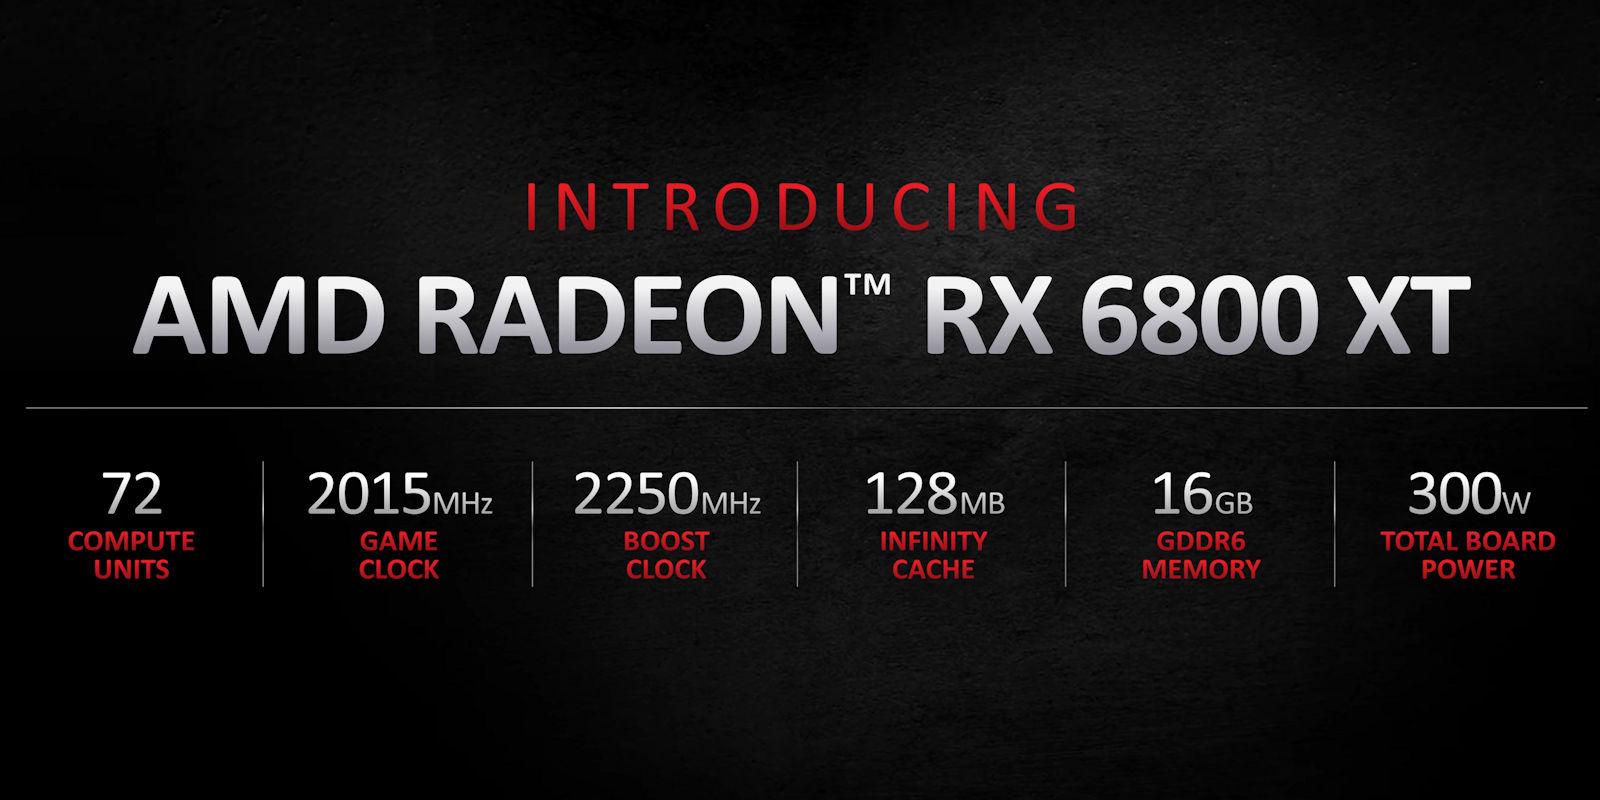 AMD-Radeon-RX-6800-XT-Specifications-1.jpg